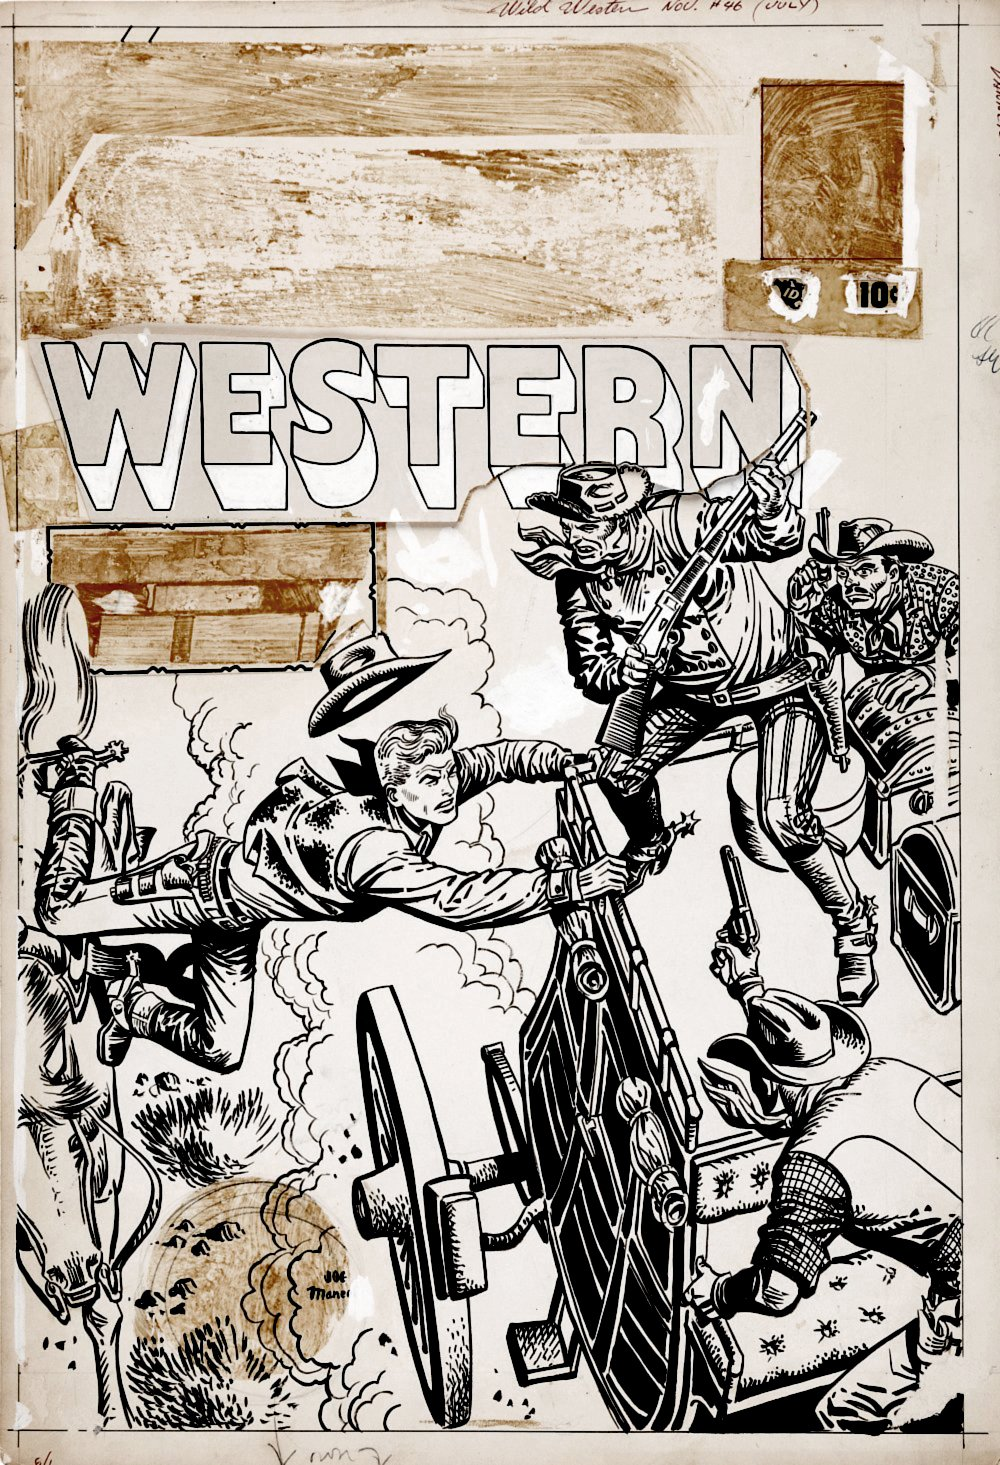 Wild Western #46 GOLDEN AGE MARVEL COMICS Cover (Large Art) 1955